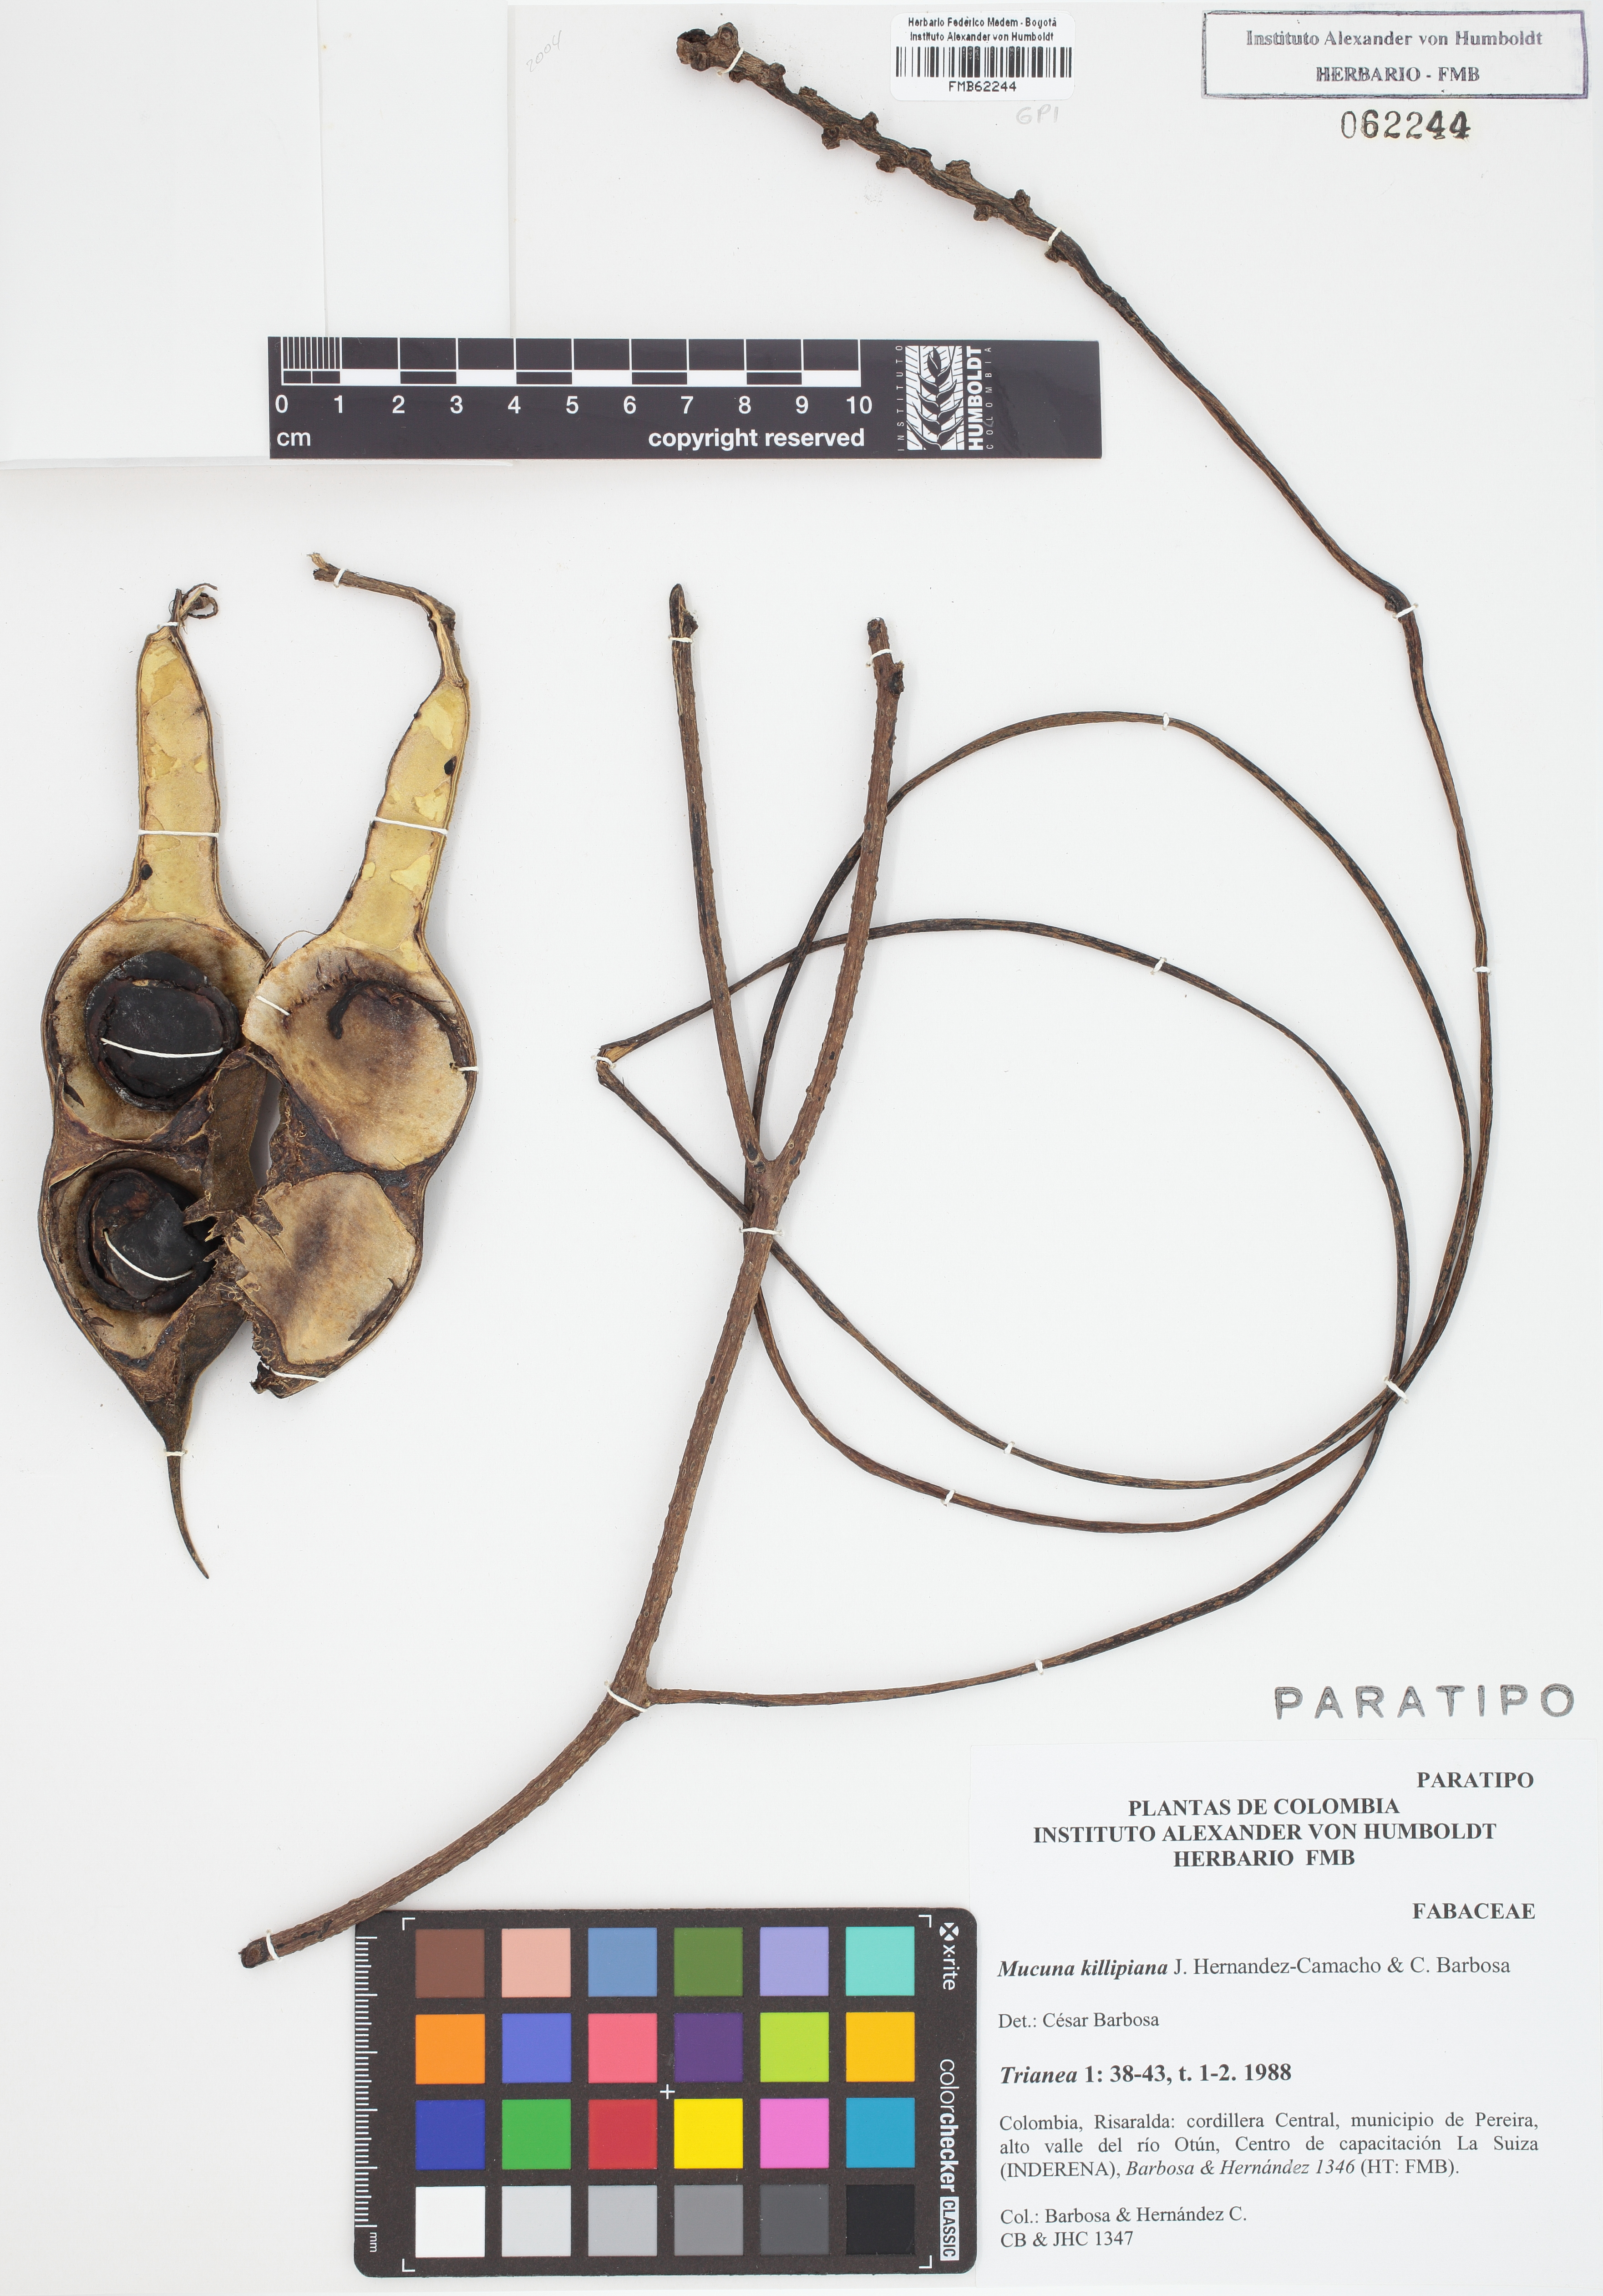 Paratipo de <em>Mucuna killipiana</em>, FMB-62244, Fotografía por Robles A.